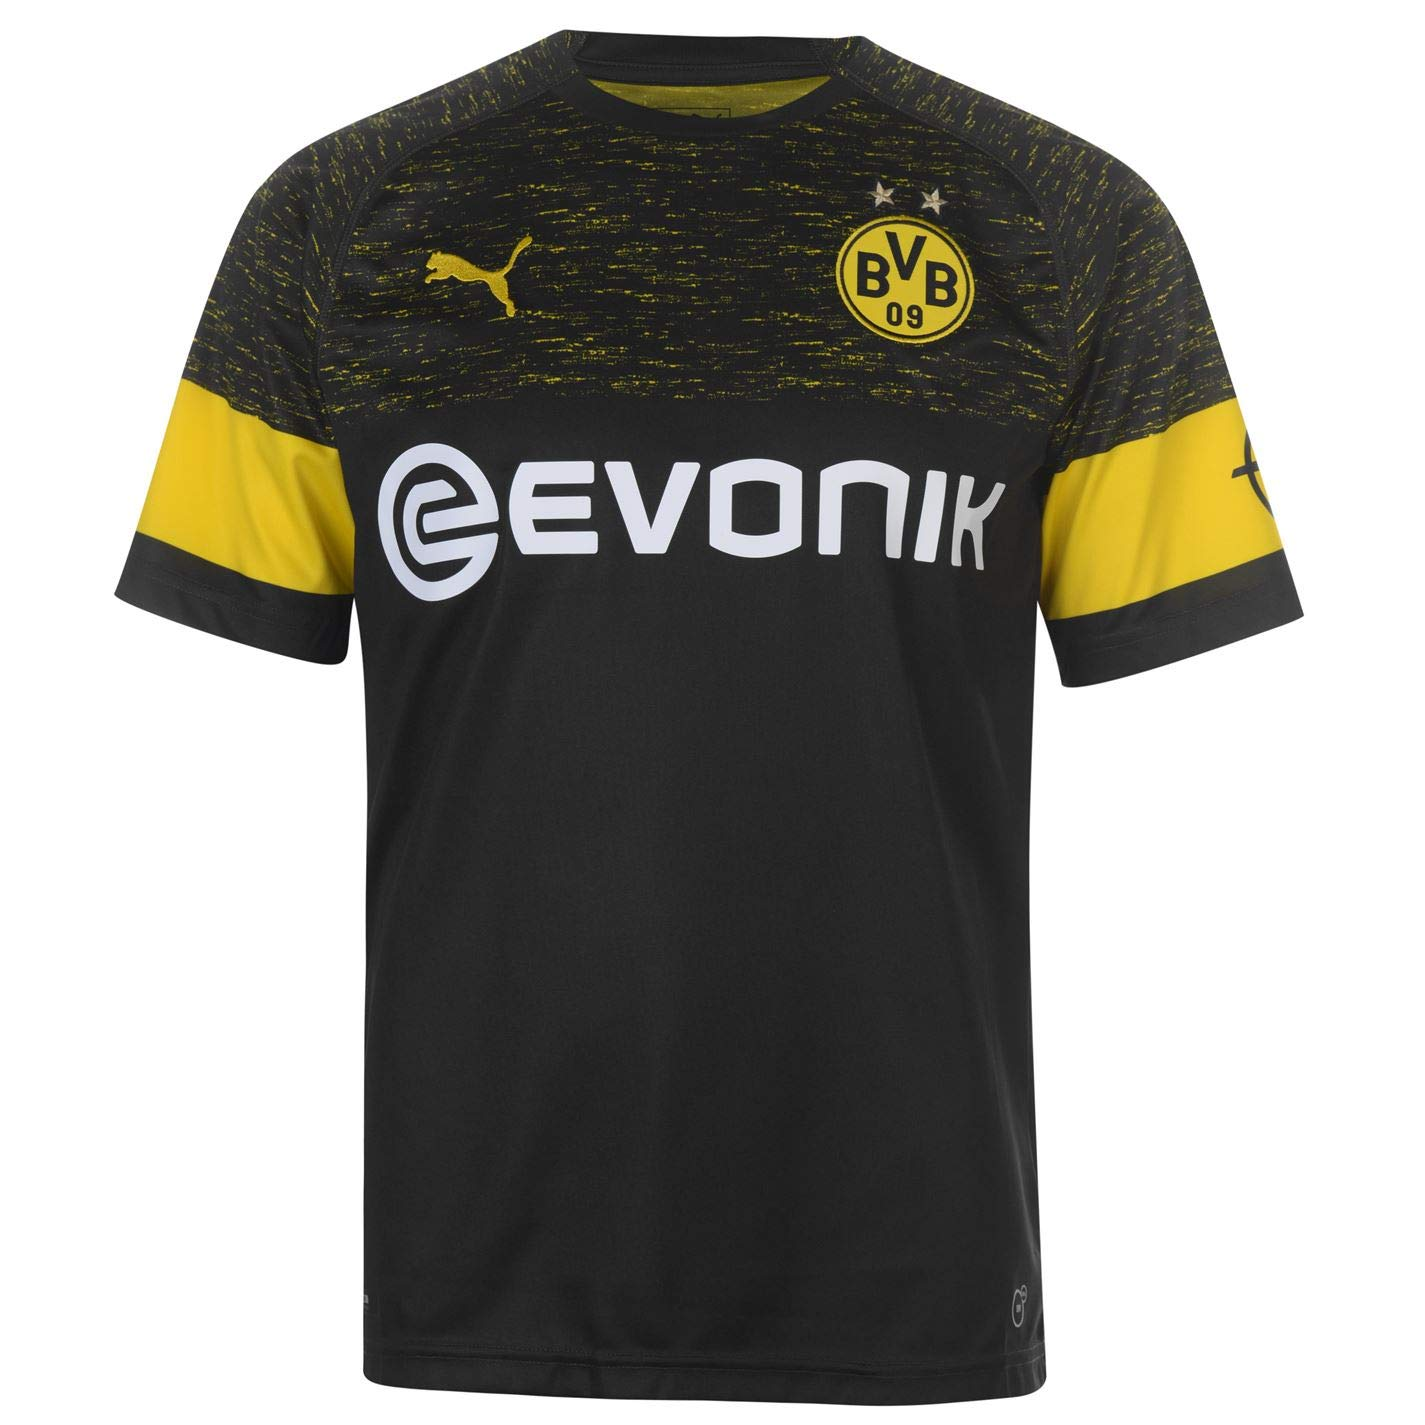 PUMA 2018-2019 Borussia Dortmund Away Football Shirt